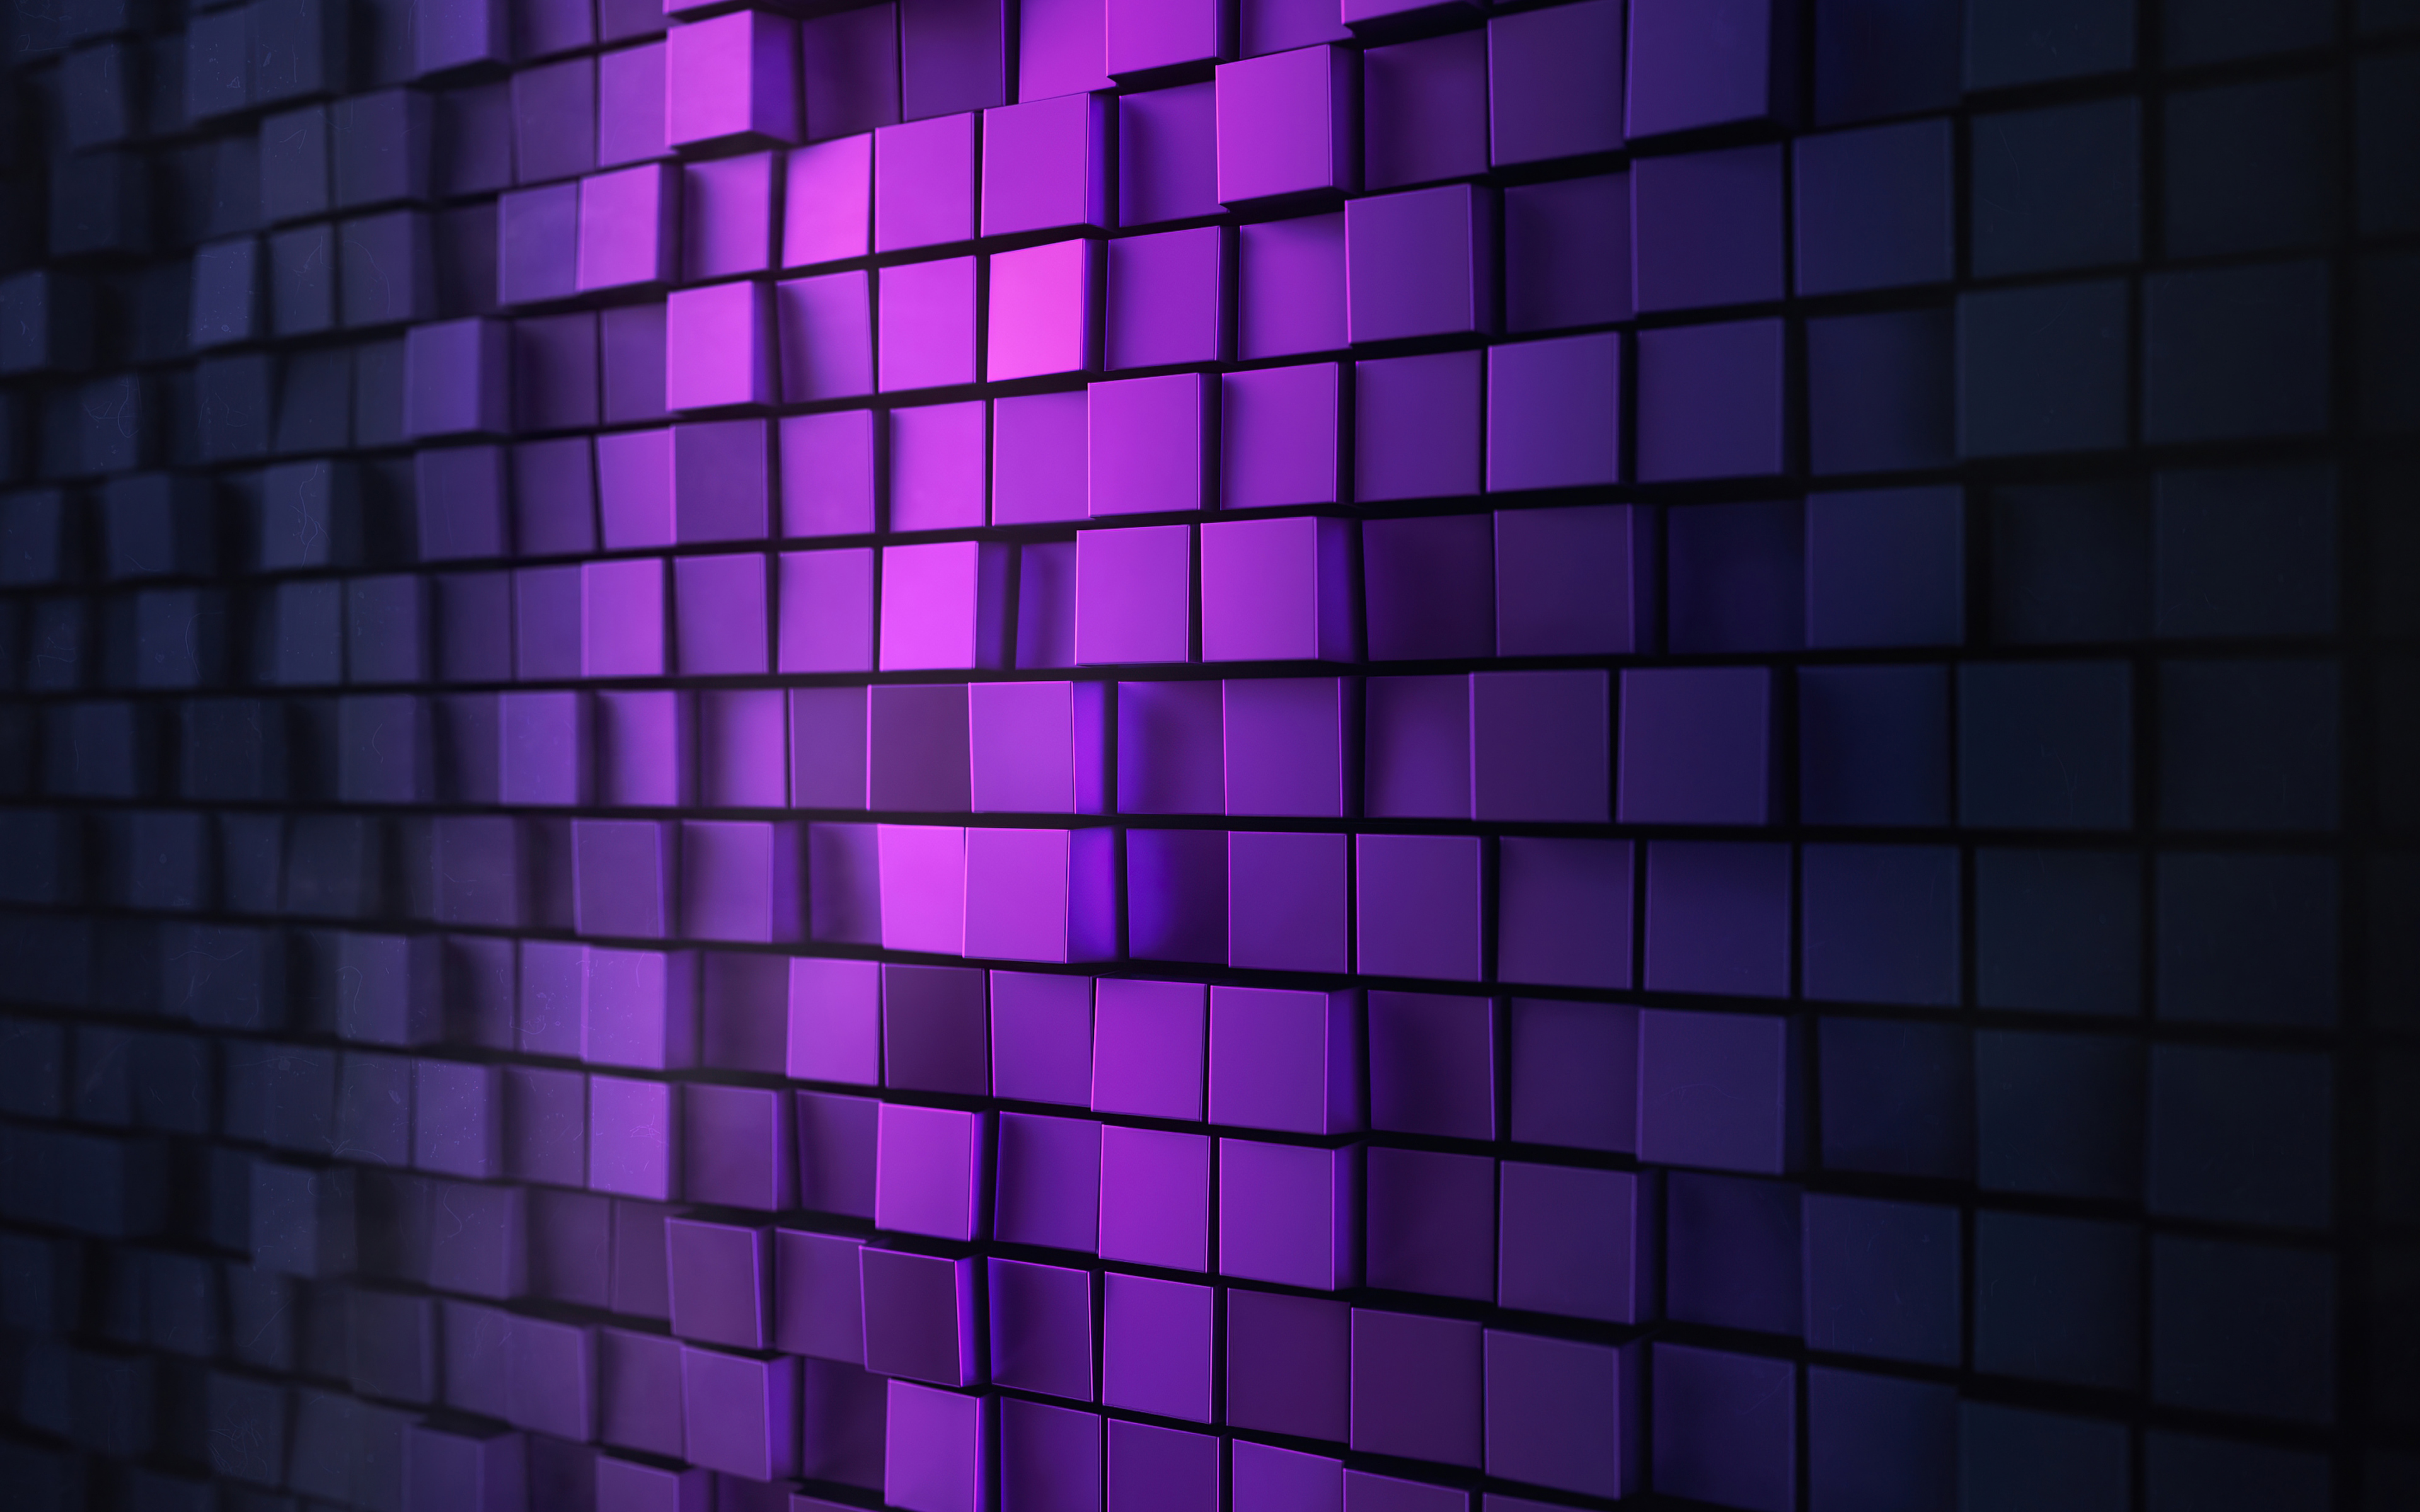 3d-purple-wall-abstract-4k-pm.jpg